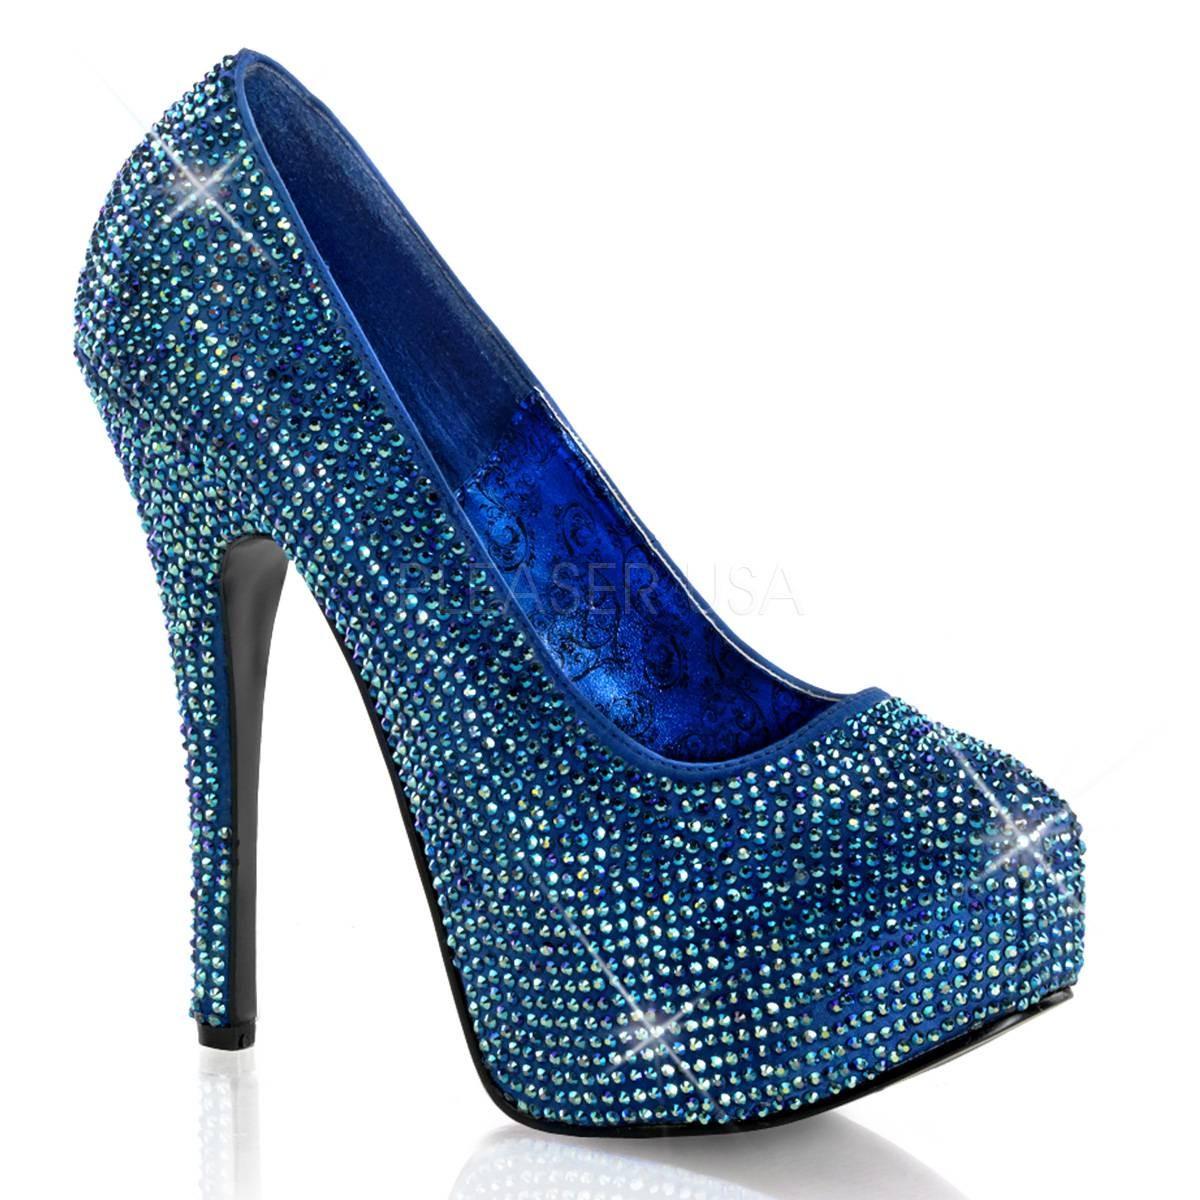 Highheels - TEEZE 06R ° Damen Pumps ° Blau Satin ° Bordello  - Onlineshop RedSixty